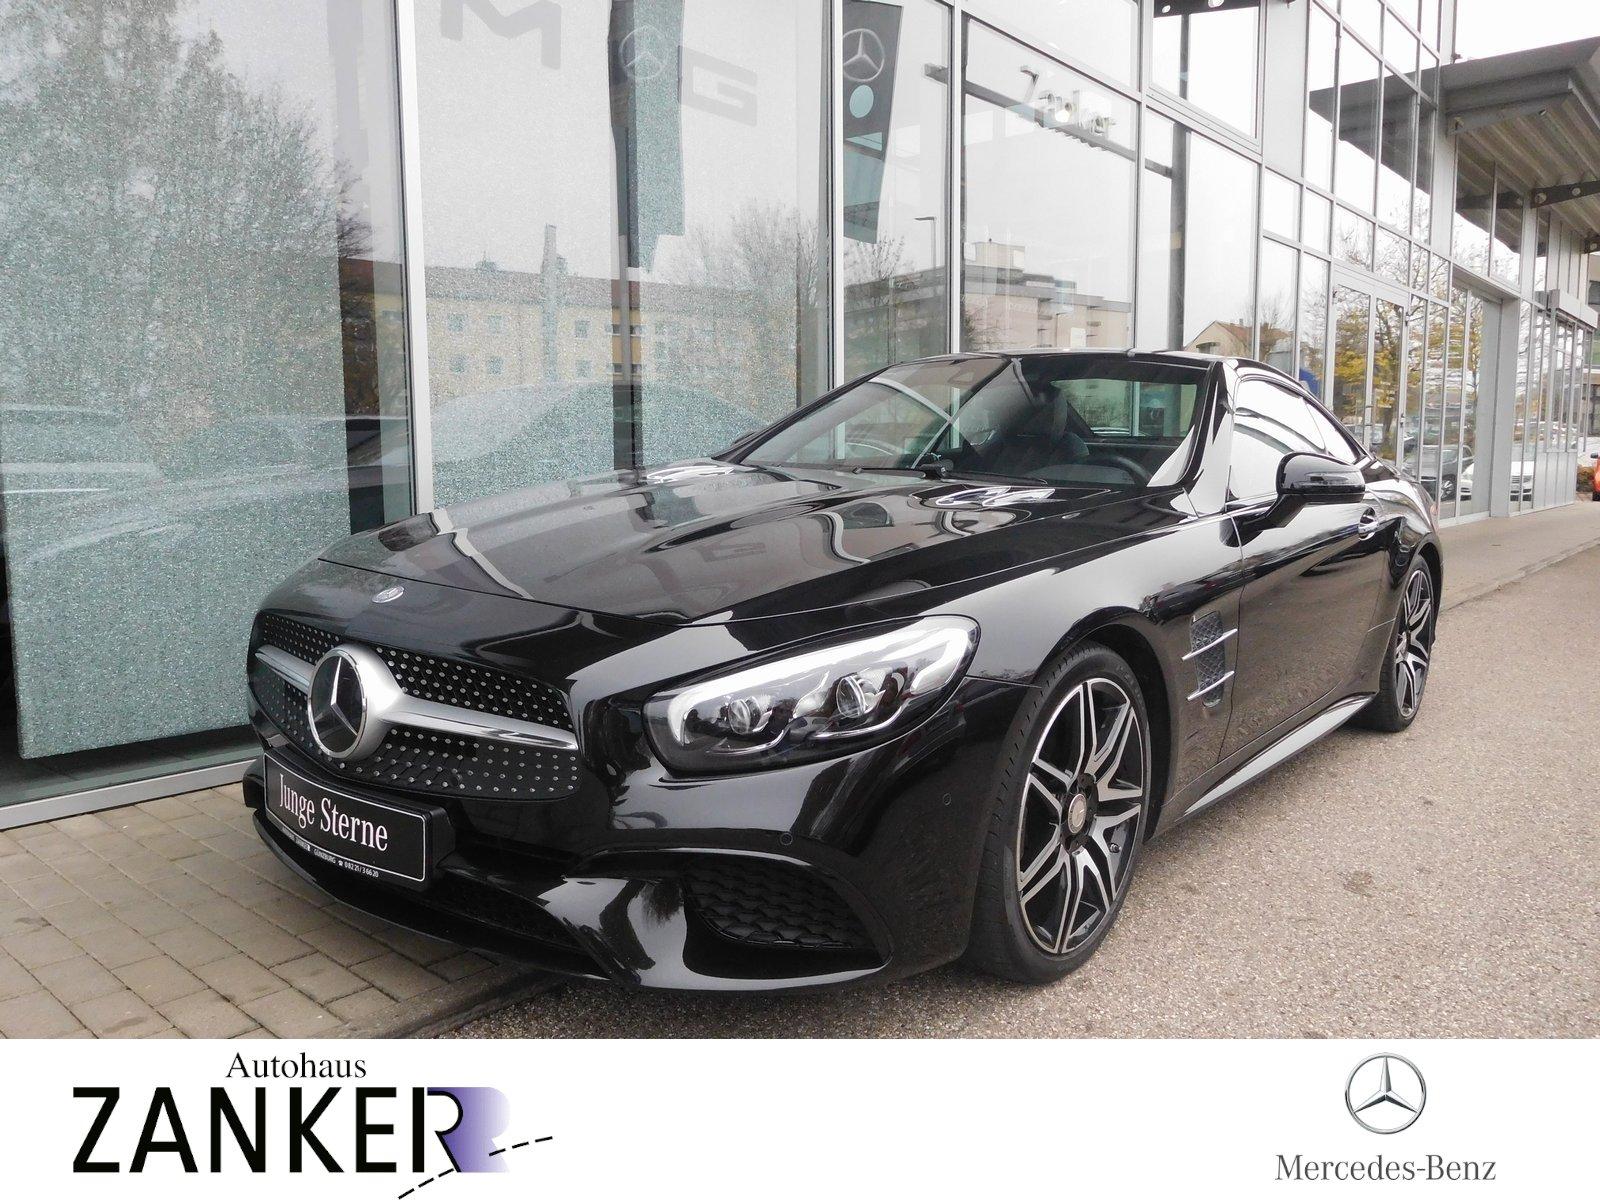 Mercedes-Benz SL 500 *COMAND*MAGIC-SKY*KEY-LESS*AMG*EXKLUSIV*, Jahr 2017, petrol